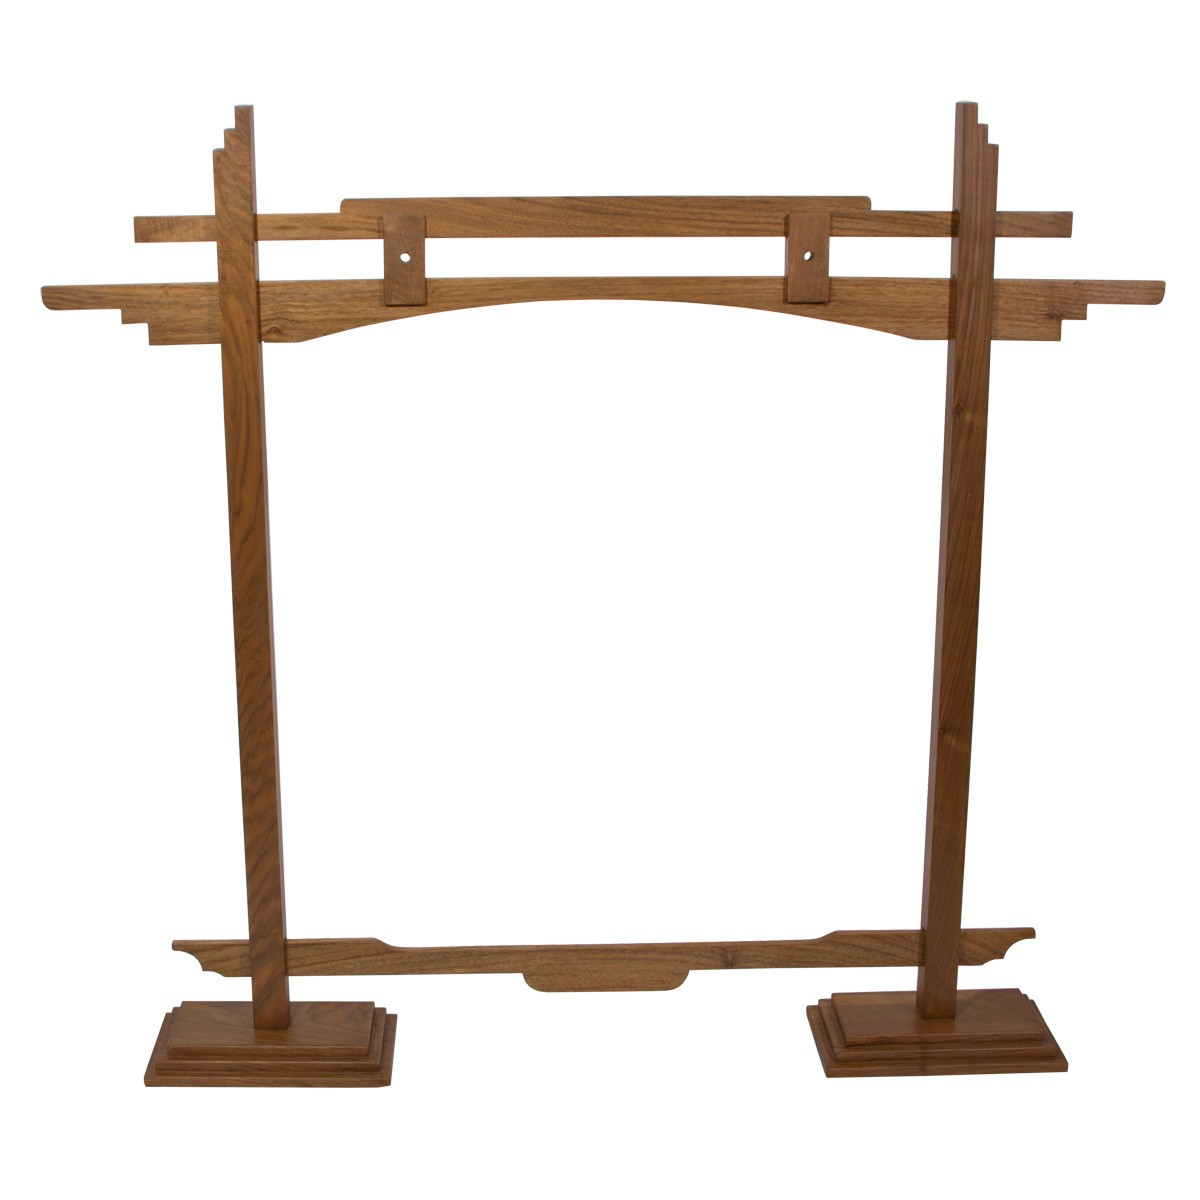 DOBANI Pedestal Gong Stand 26-Inch - Walnut